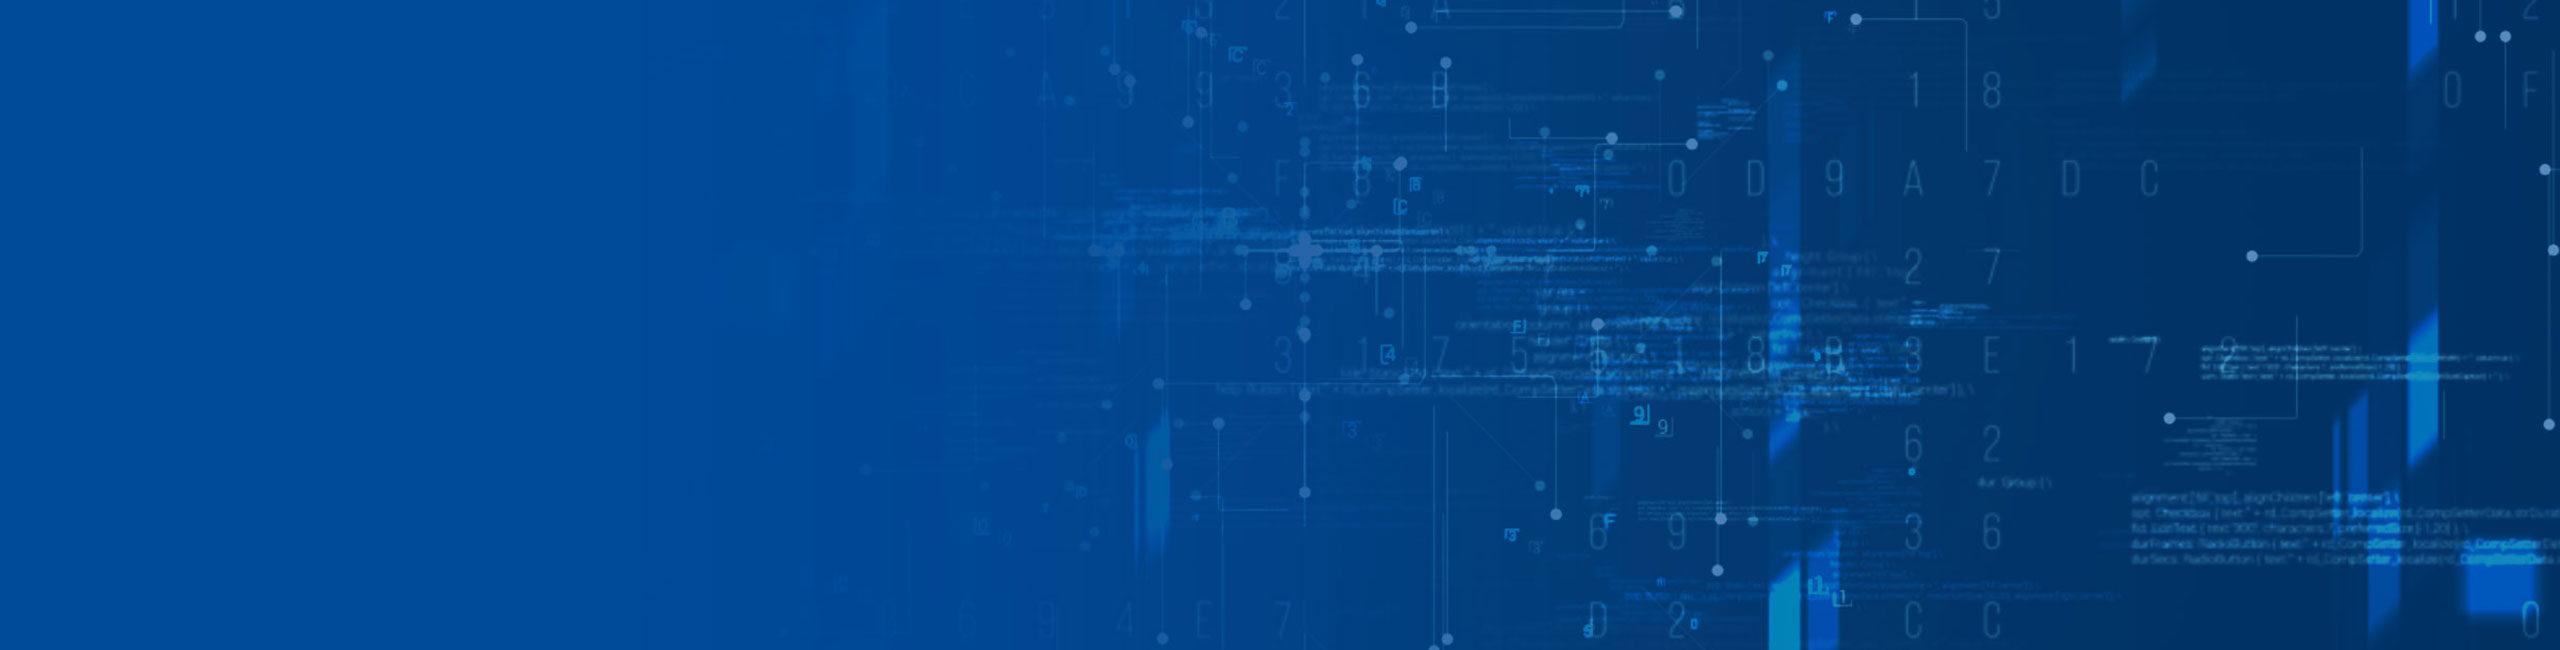 Machine Learning Code